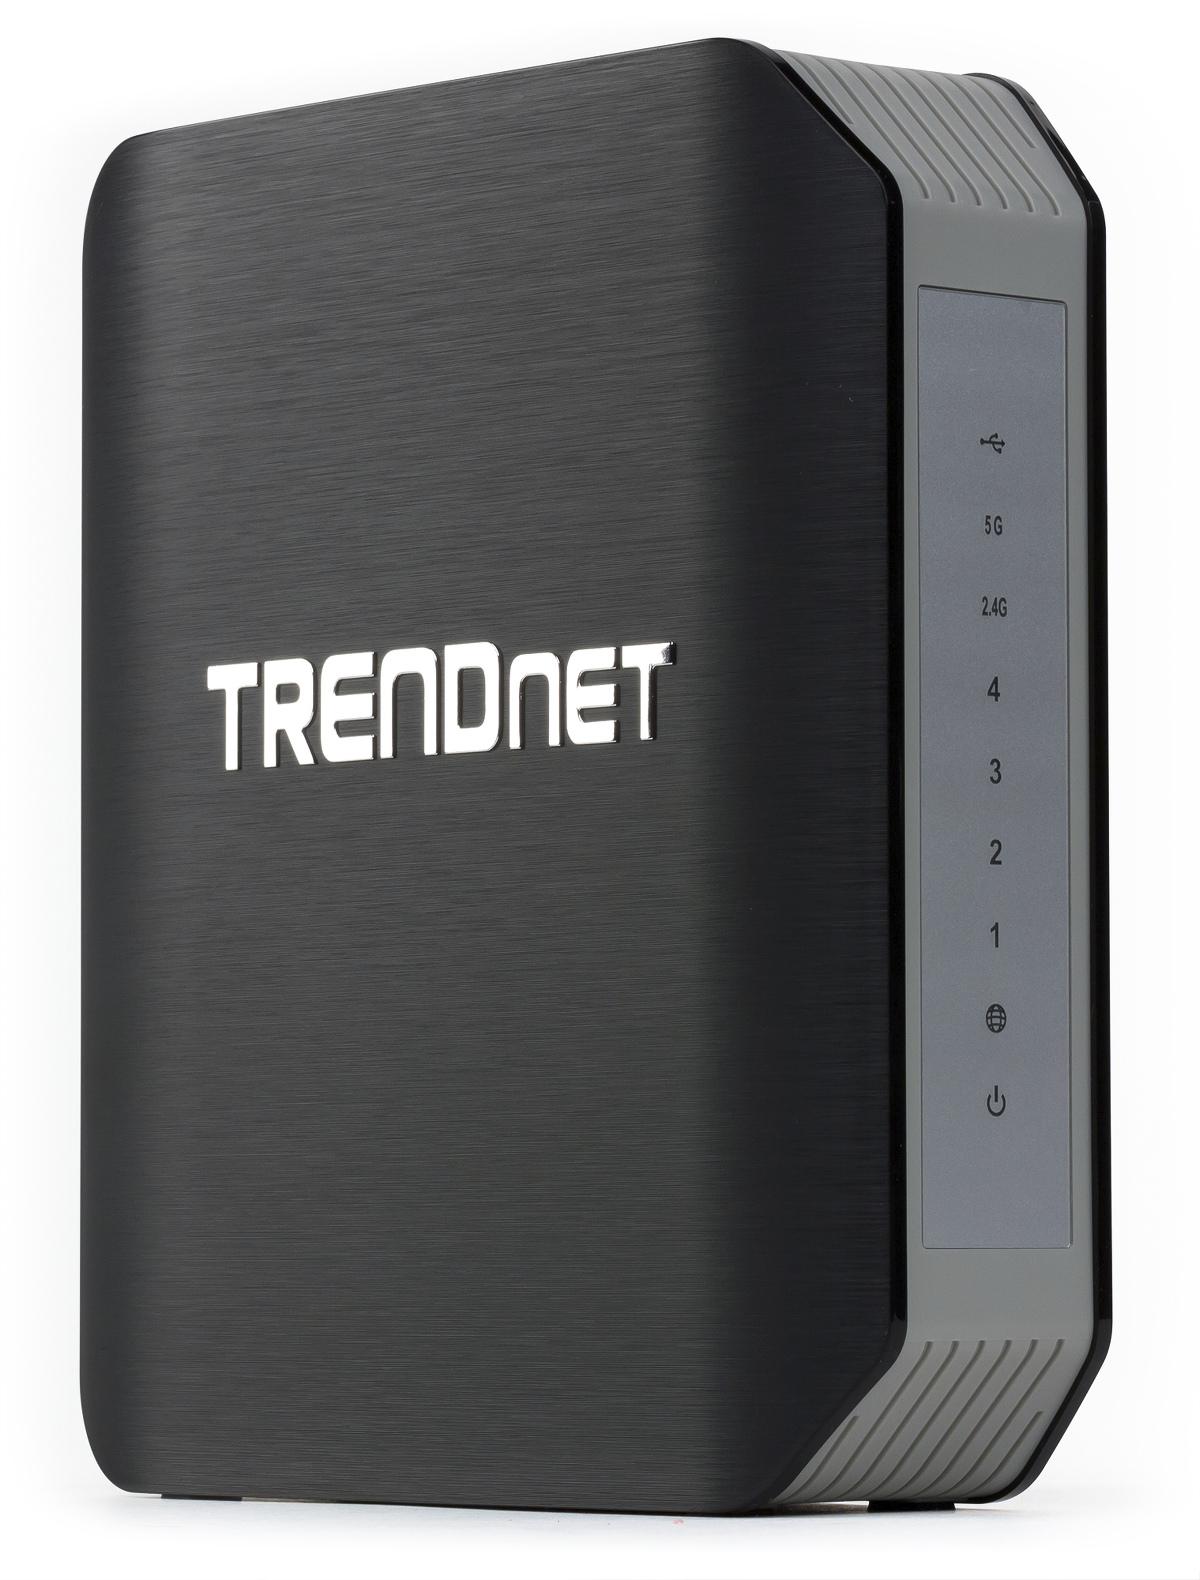 TRENDnet TN-200 (Version v1.0R) NAS 64 BIT Driver